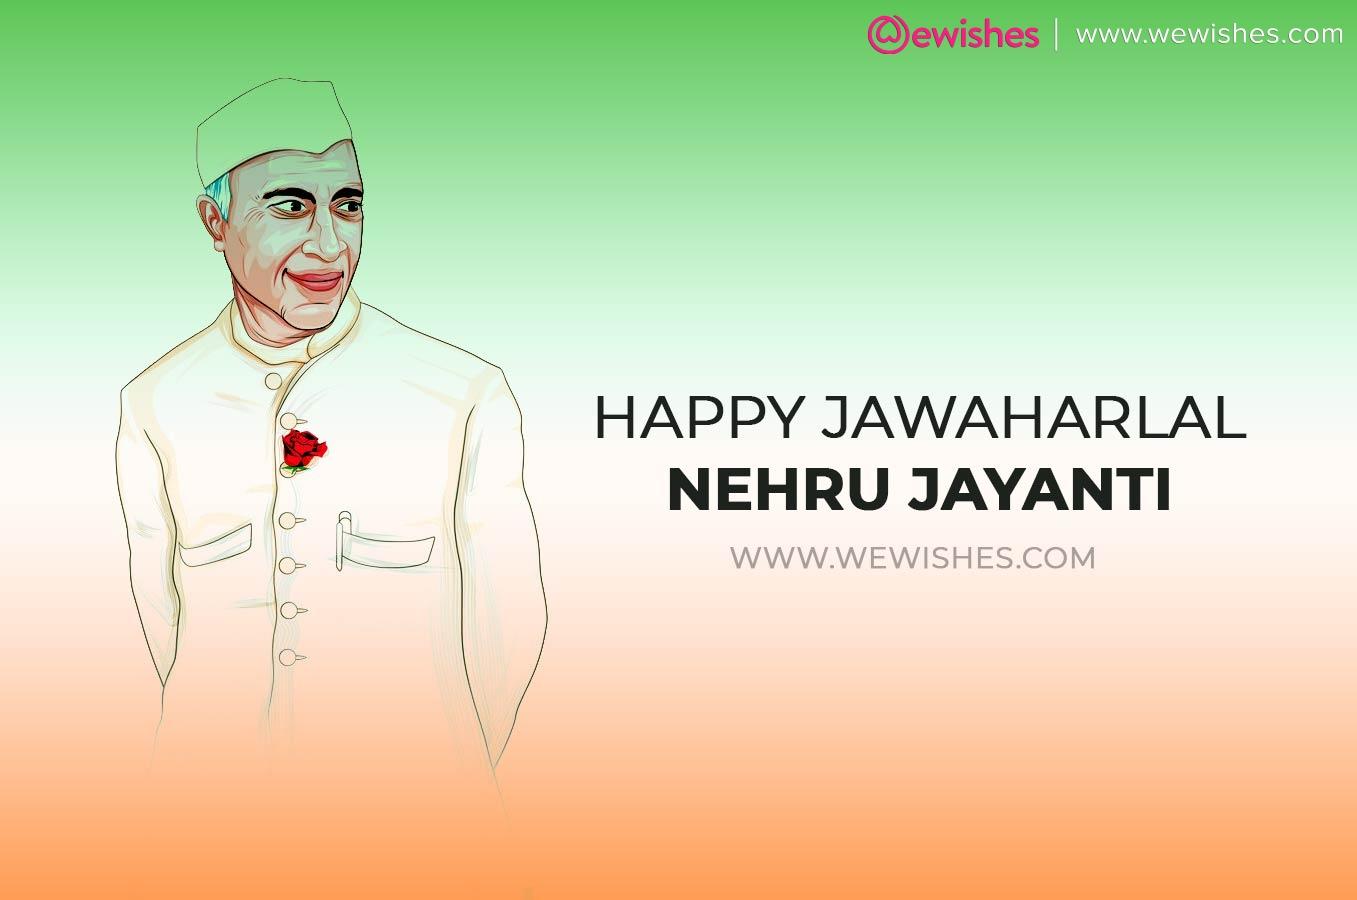 Happy Jawaharlal Nehru Jayanti 2020